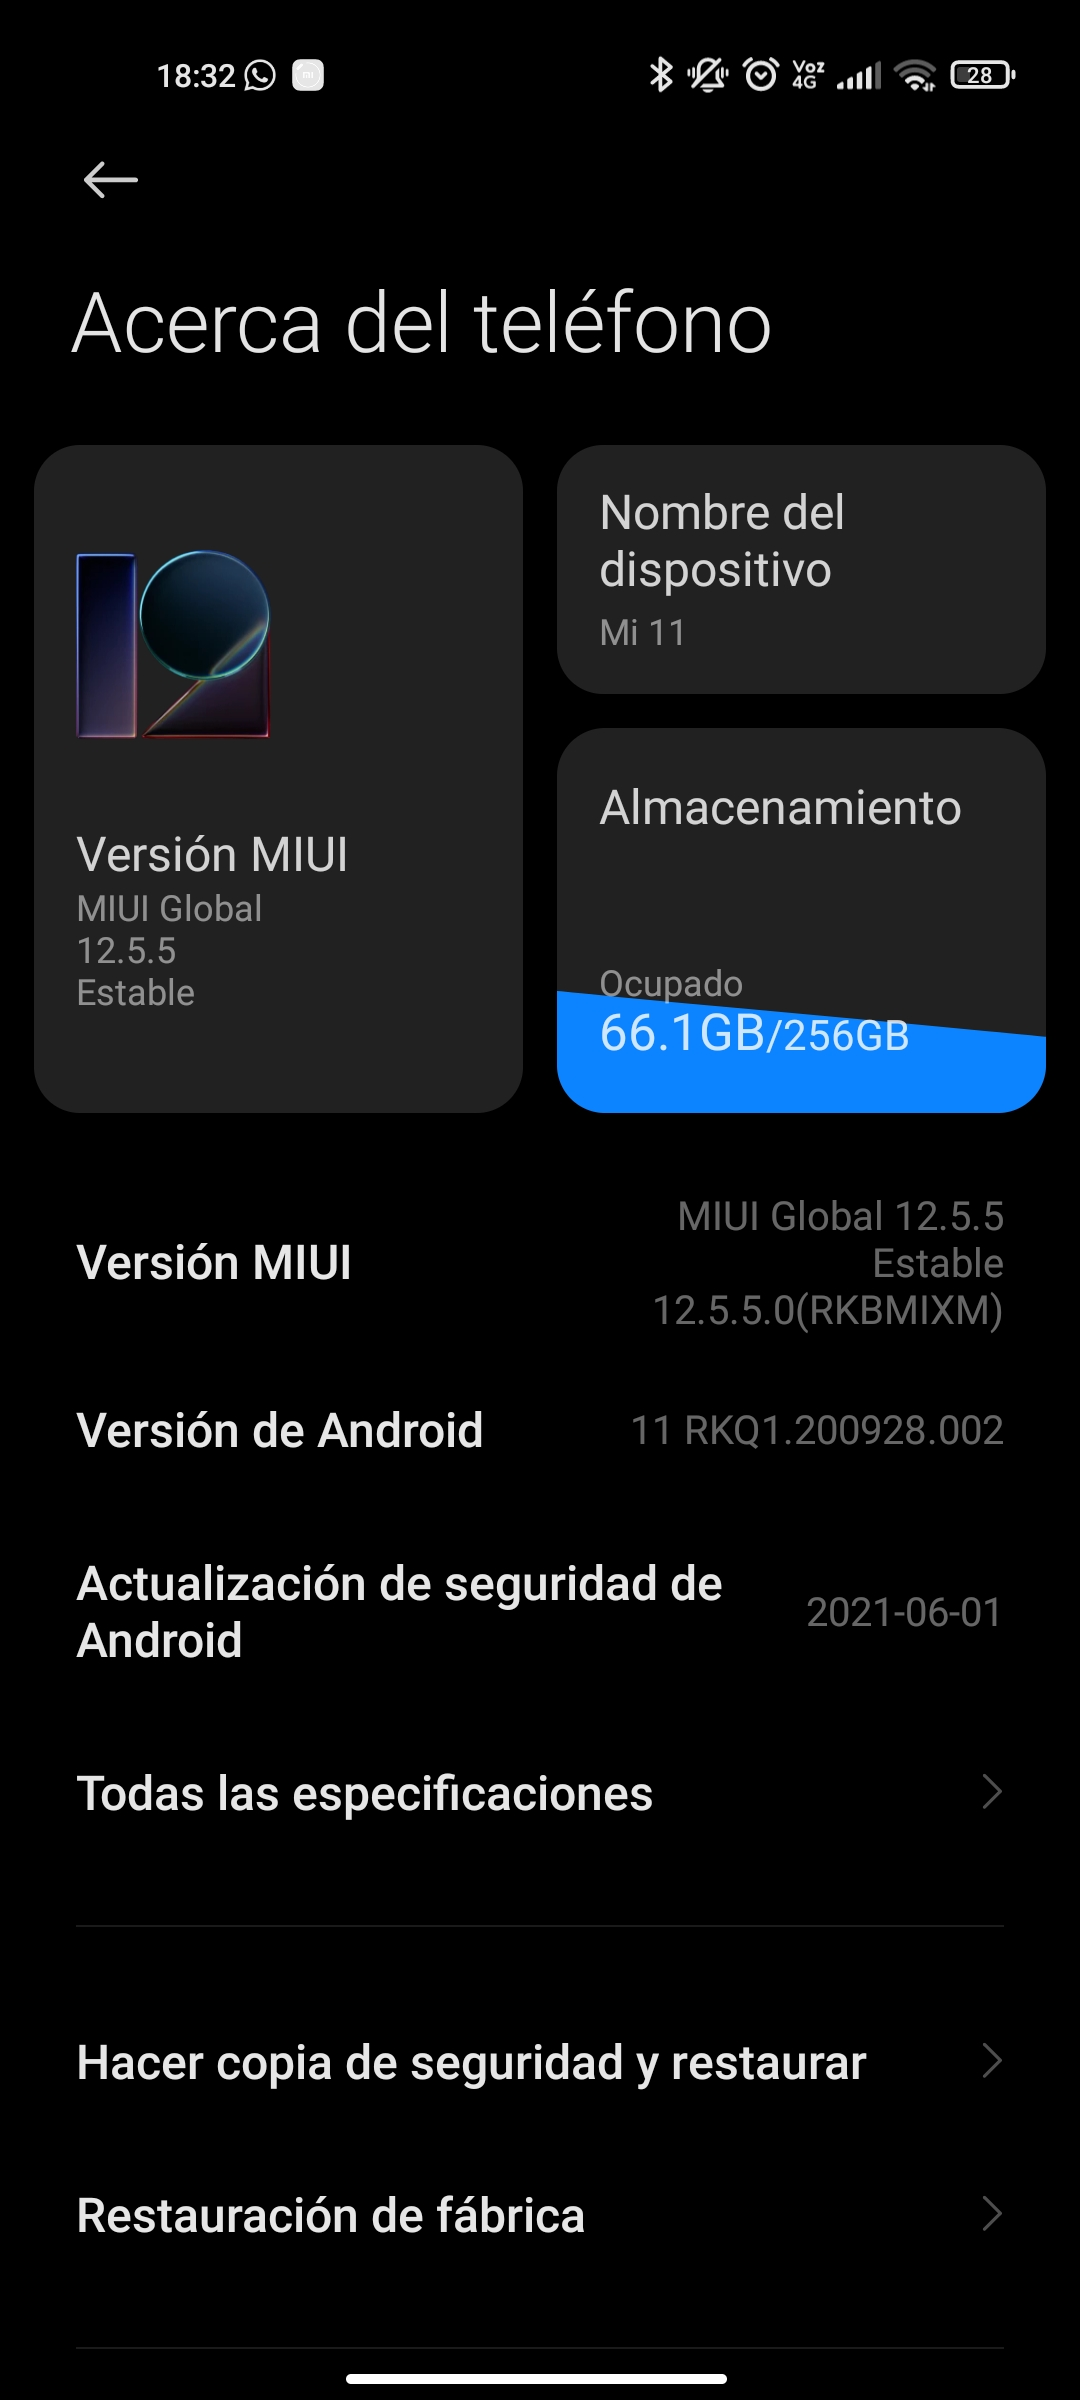 Screenshot_2021-09-20-18-32-58-977_com.android.settings.jpg